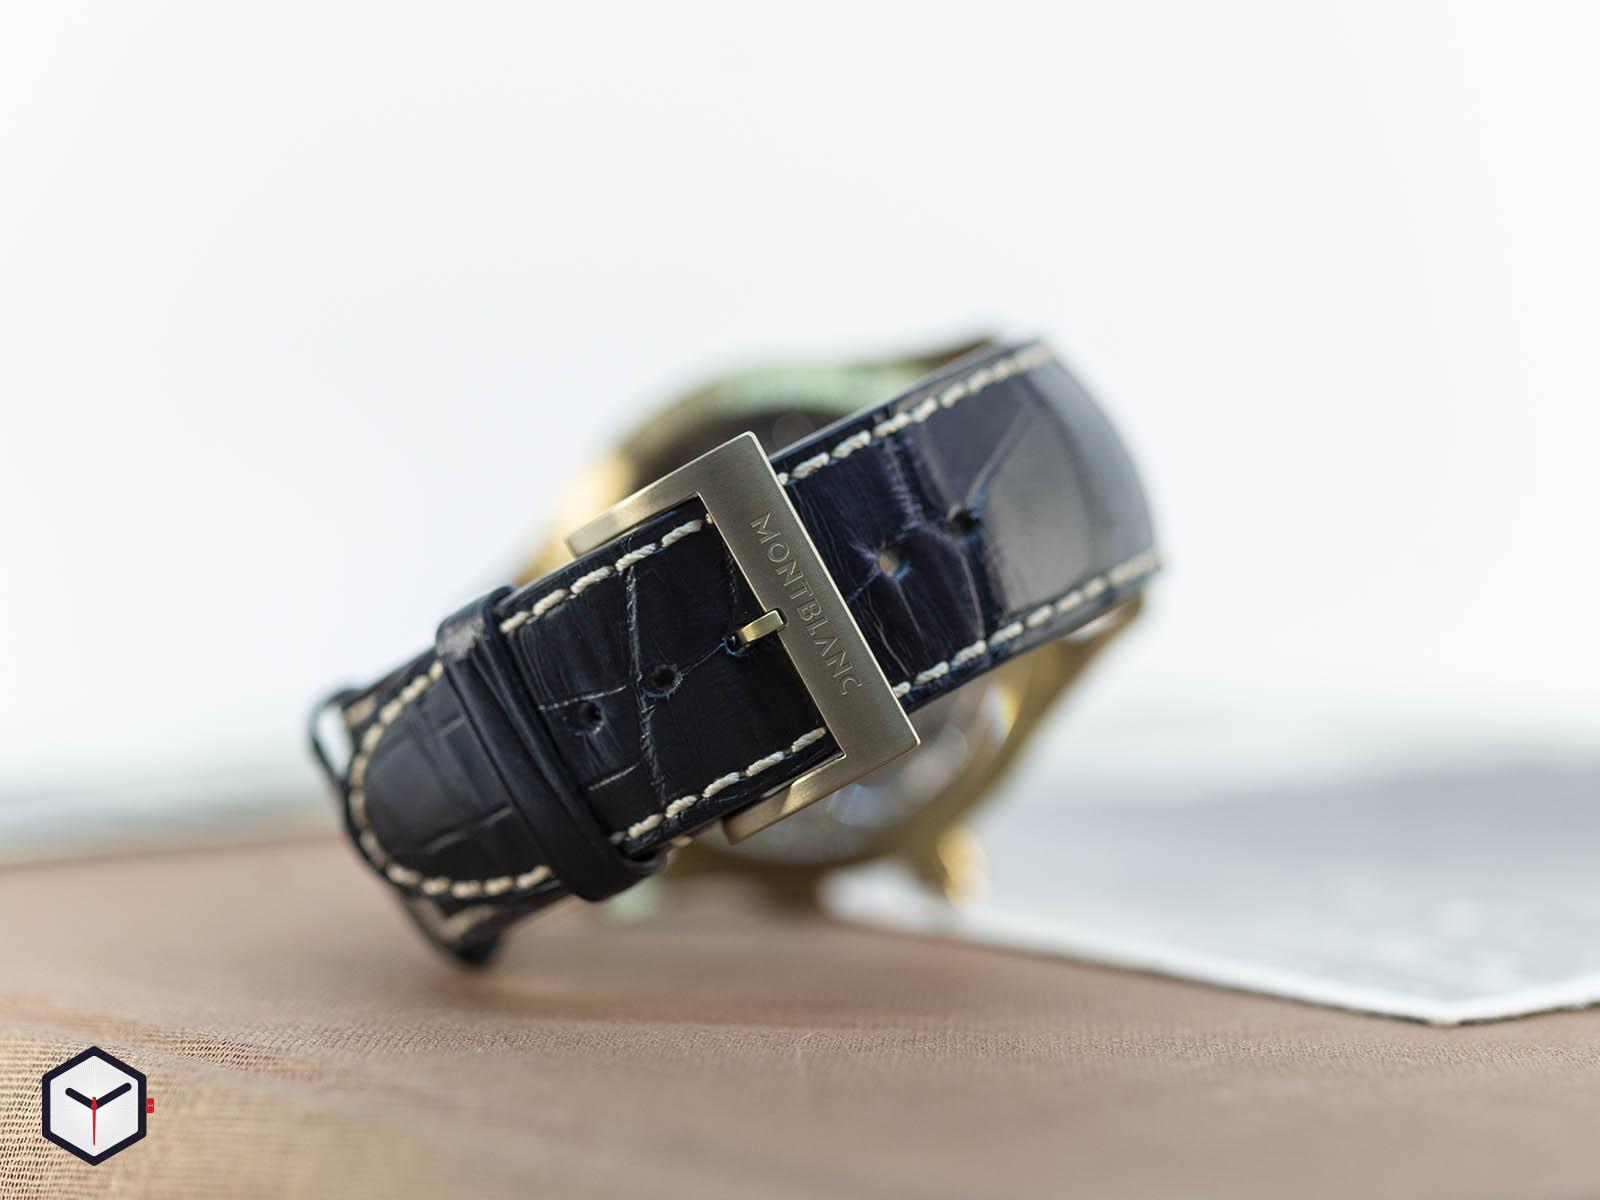 montblanc-1858-split-second-chronograph-6.jpg